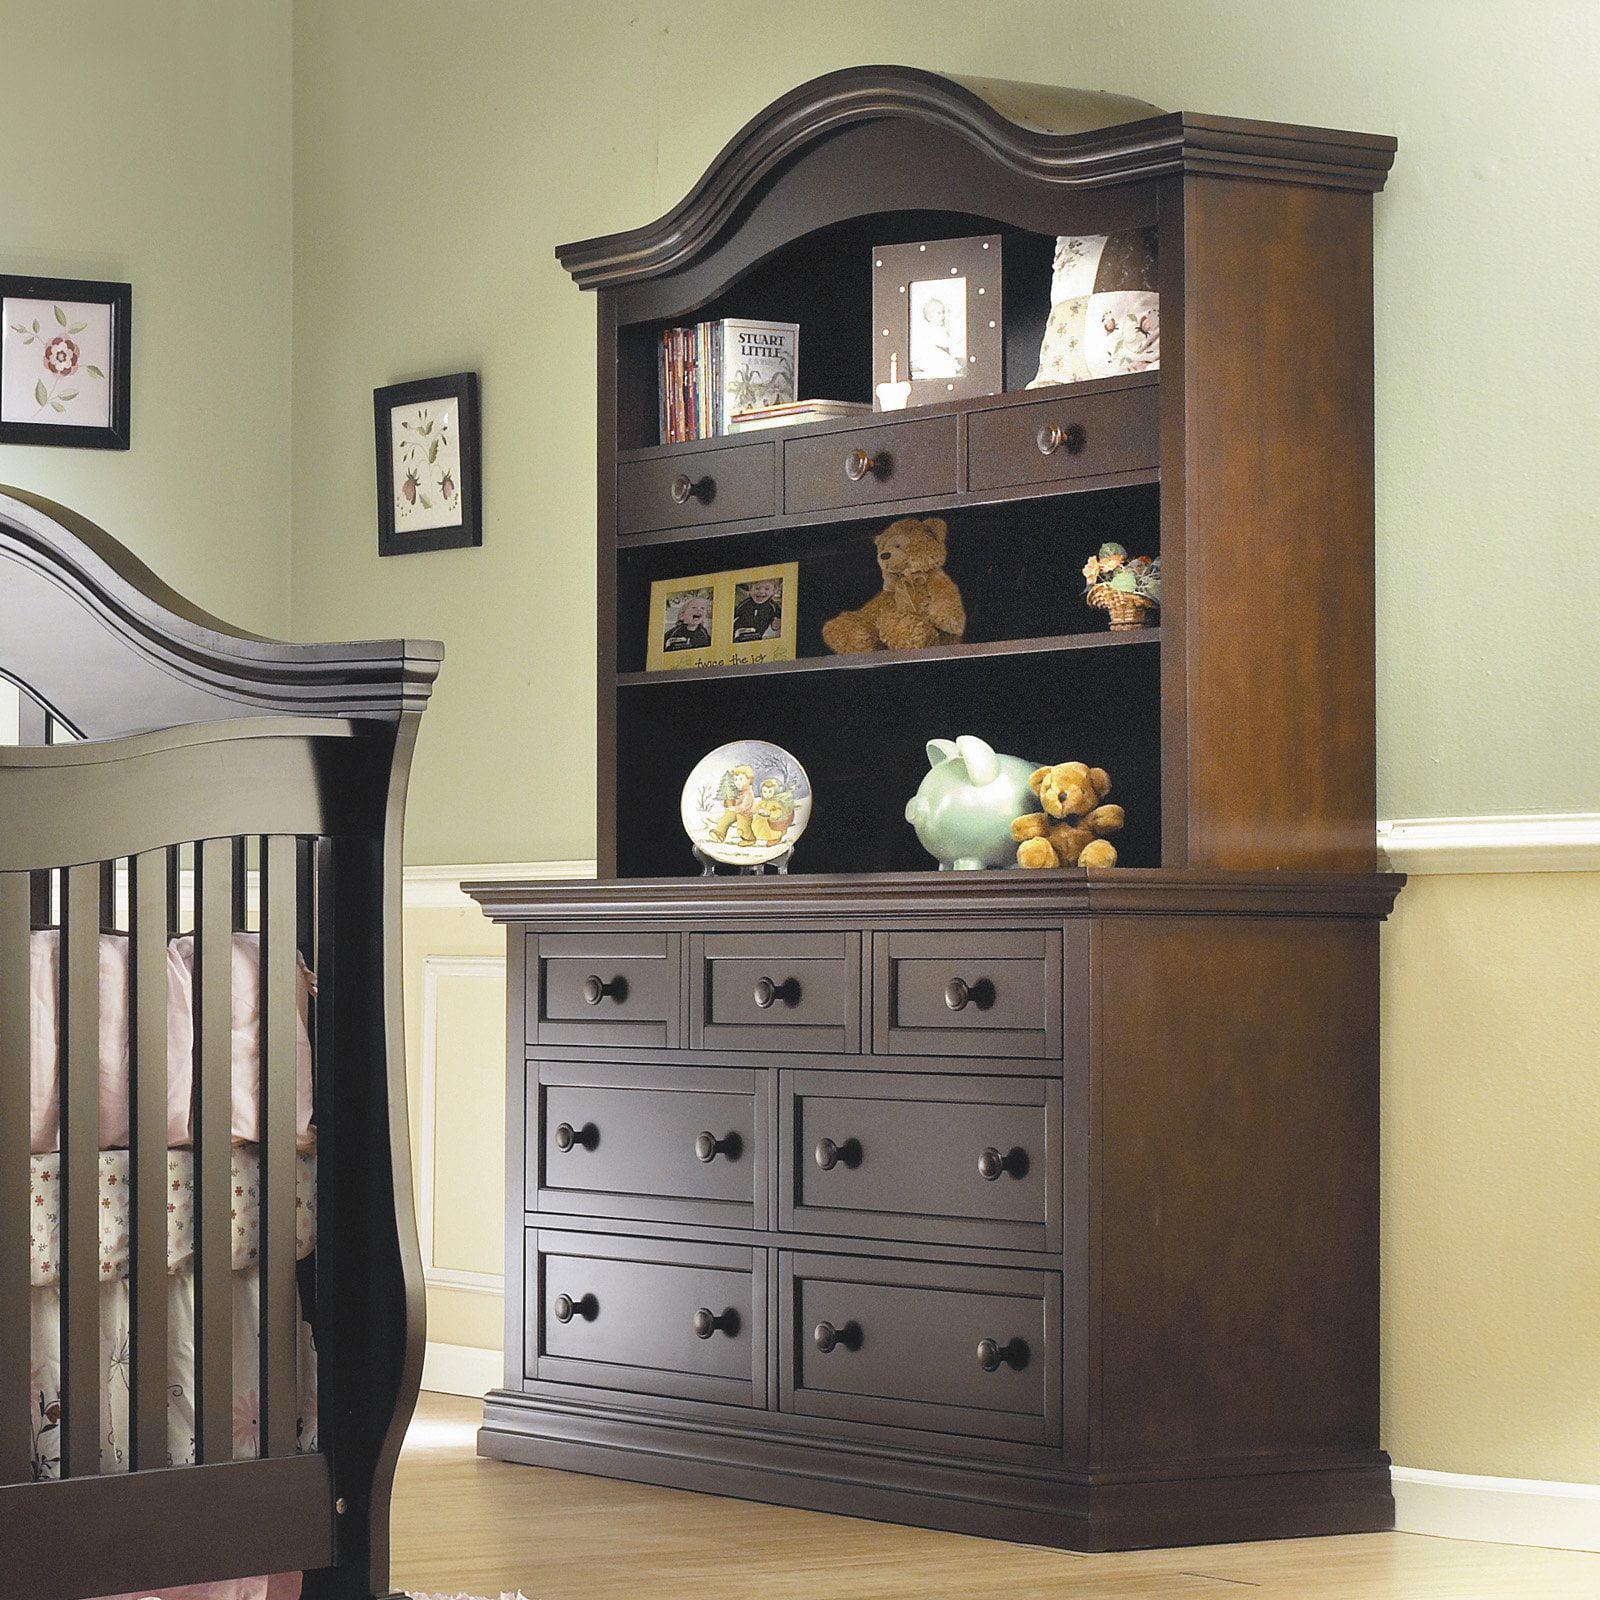 Lusso Nursery Century Double Dresser with Hutch by Lusso Nursery